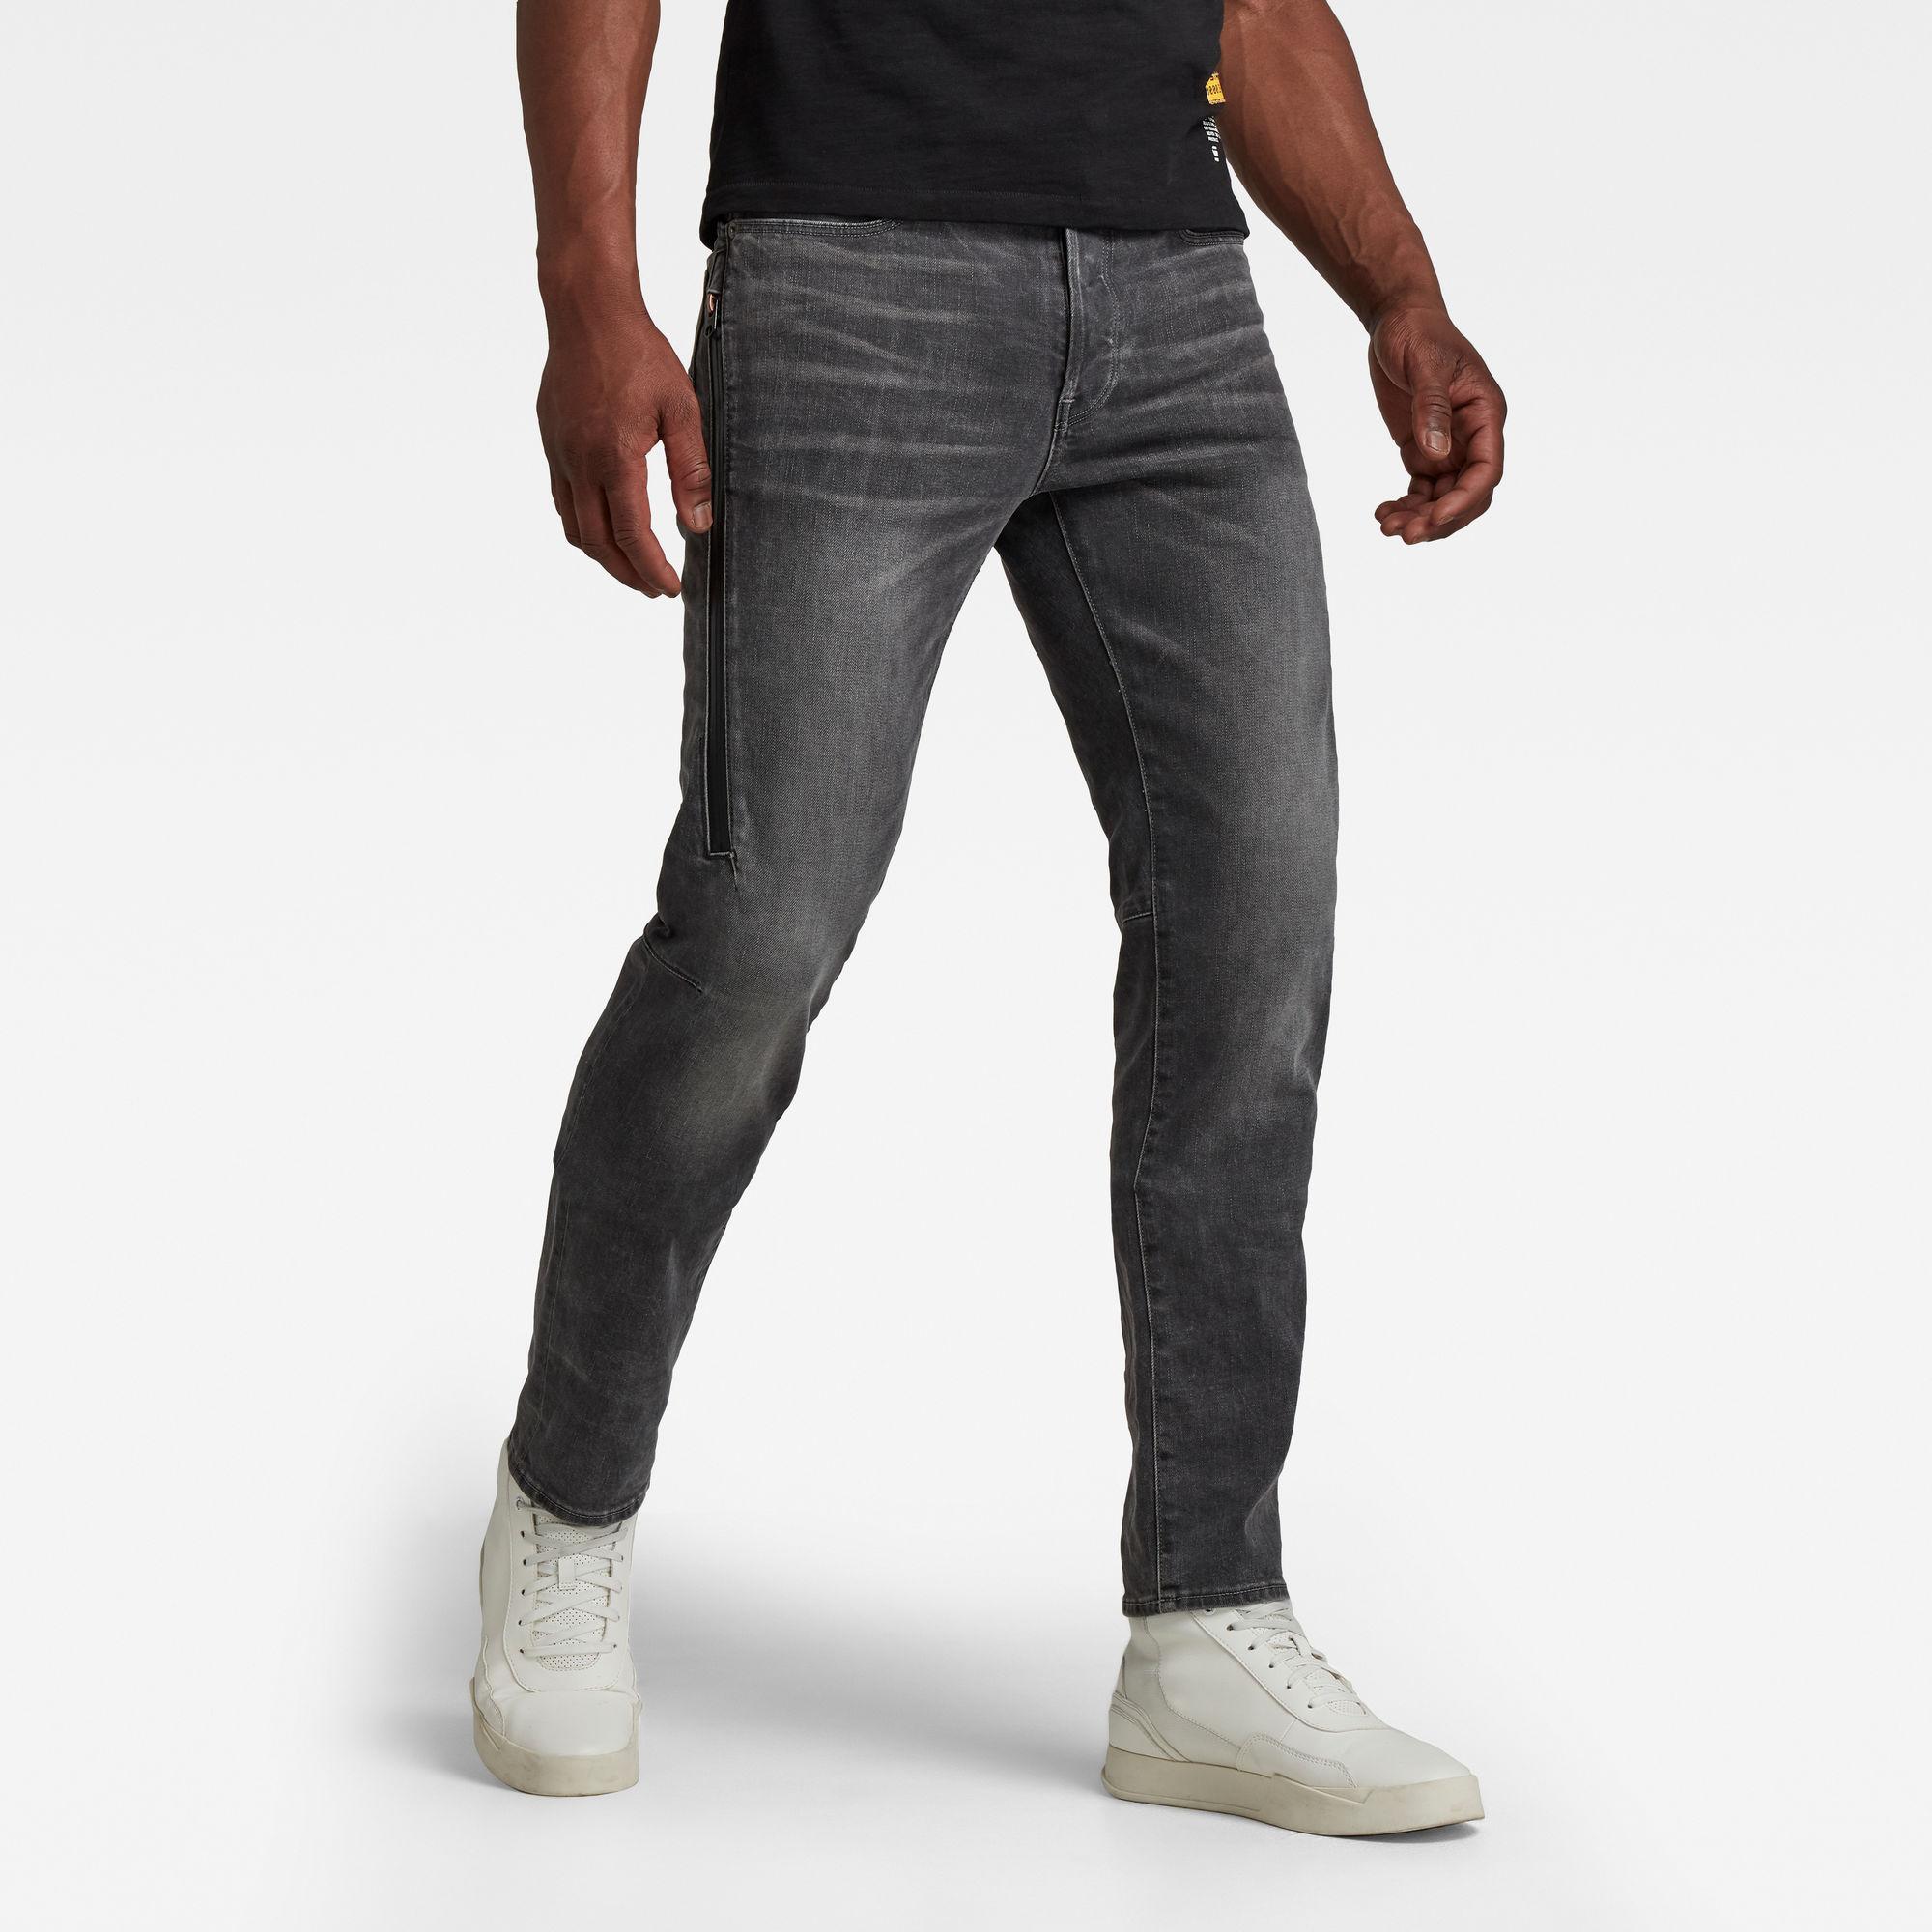 G-Star RAW Heren Citishield 3D Slim Tapered Jeans Grijs